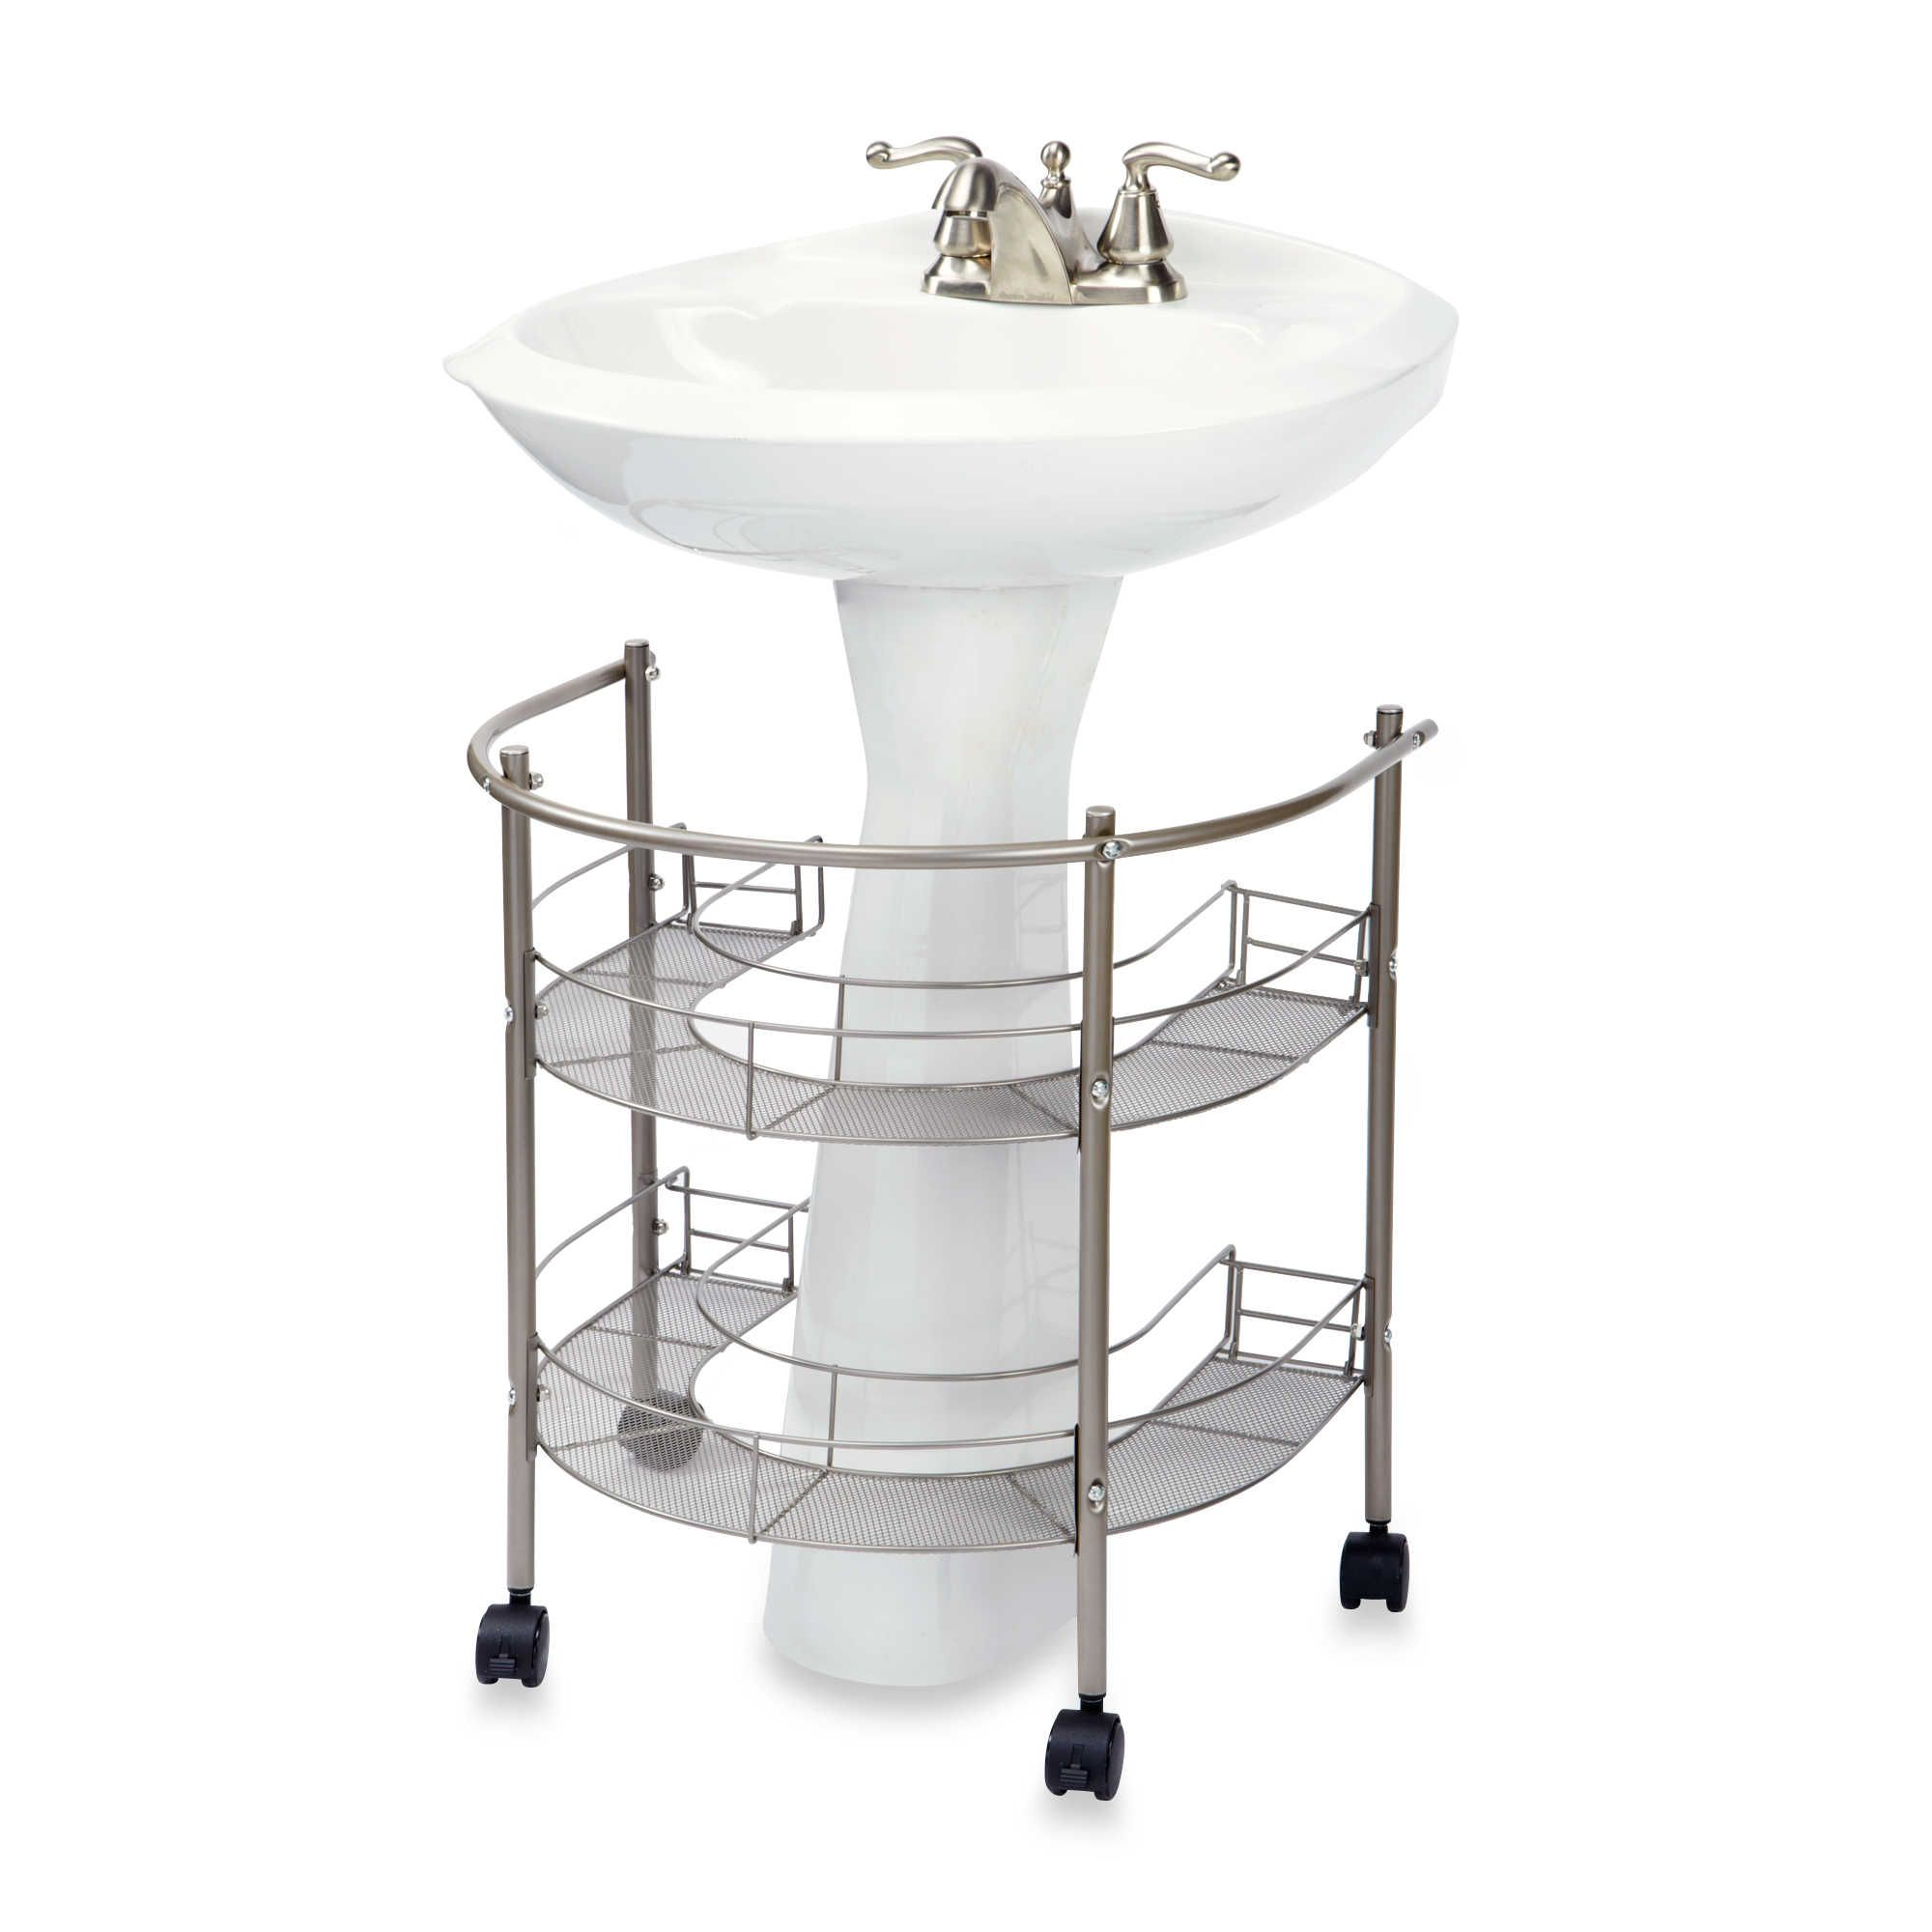 Rolling Organizer For Pedestal Sink